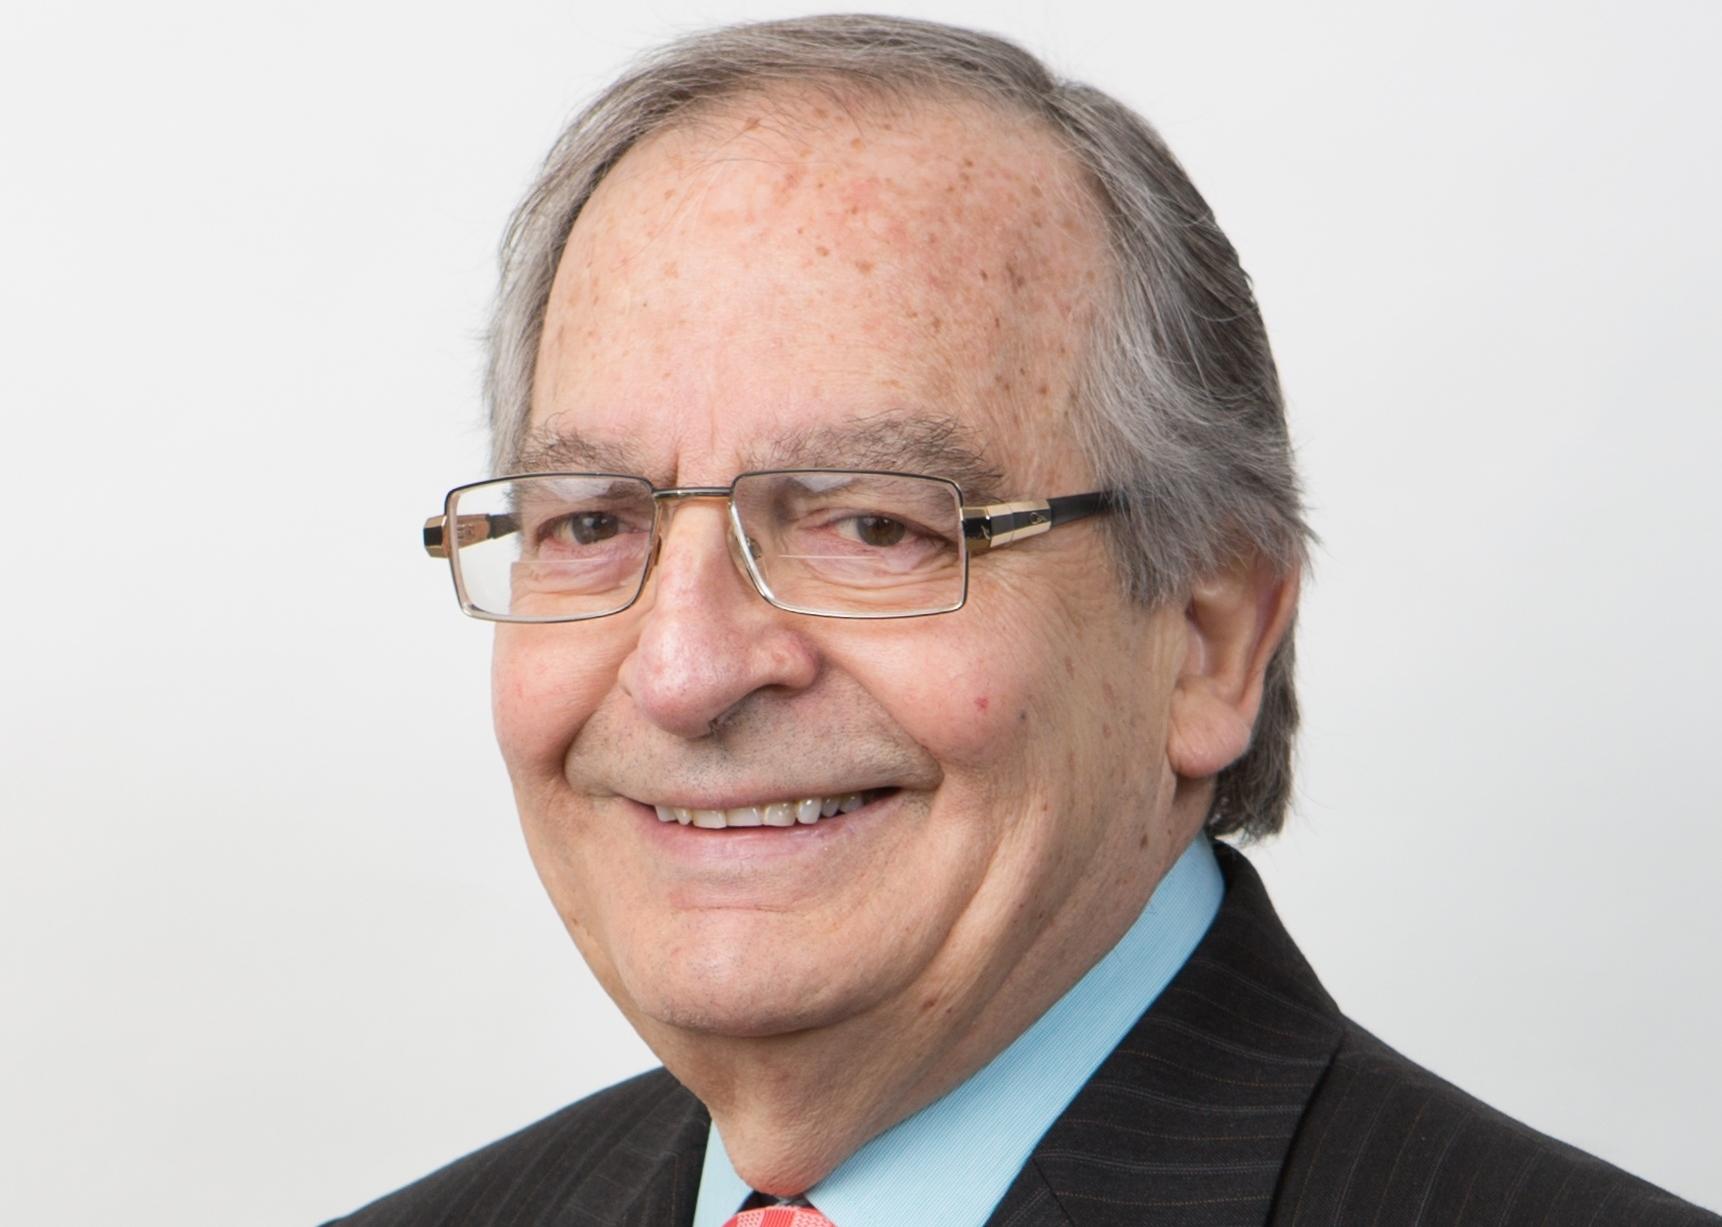 ea37a2bcc0 Bill Jennaro (Former Chairman of Festa Italiana Milwaukee)